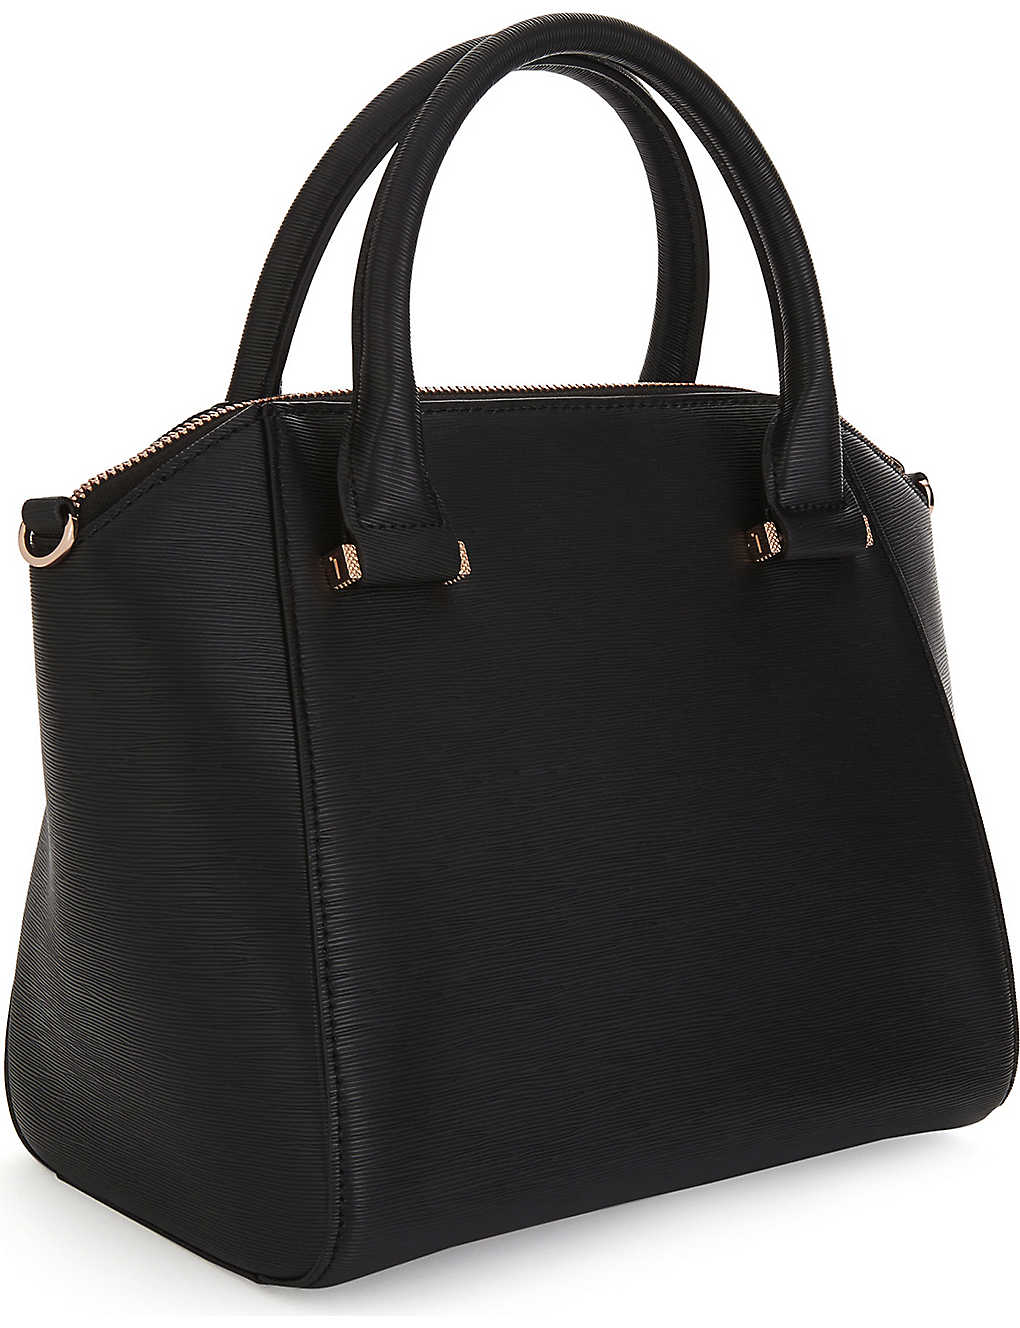 70b44813a TED BAKER - Charmea leather tote bag